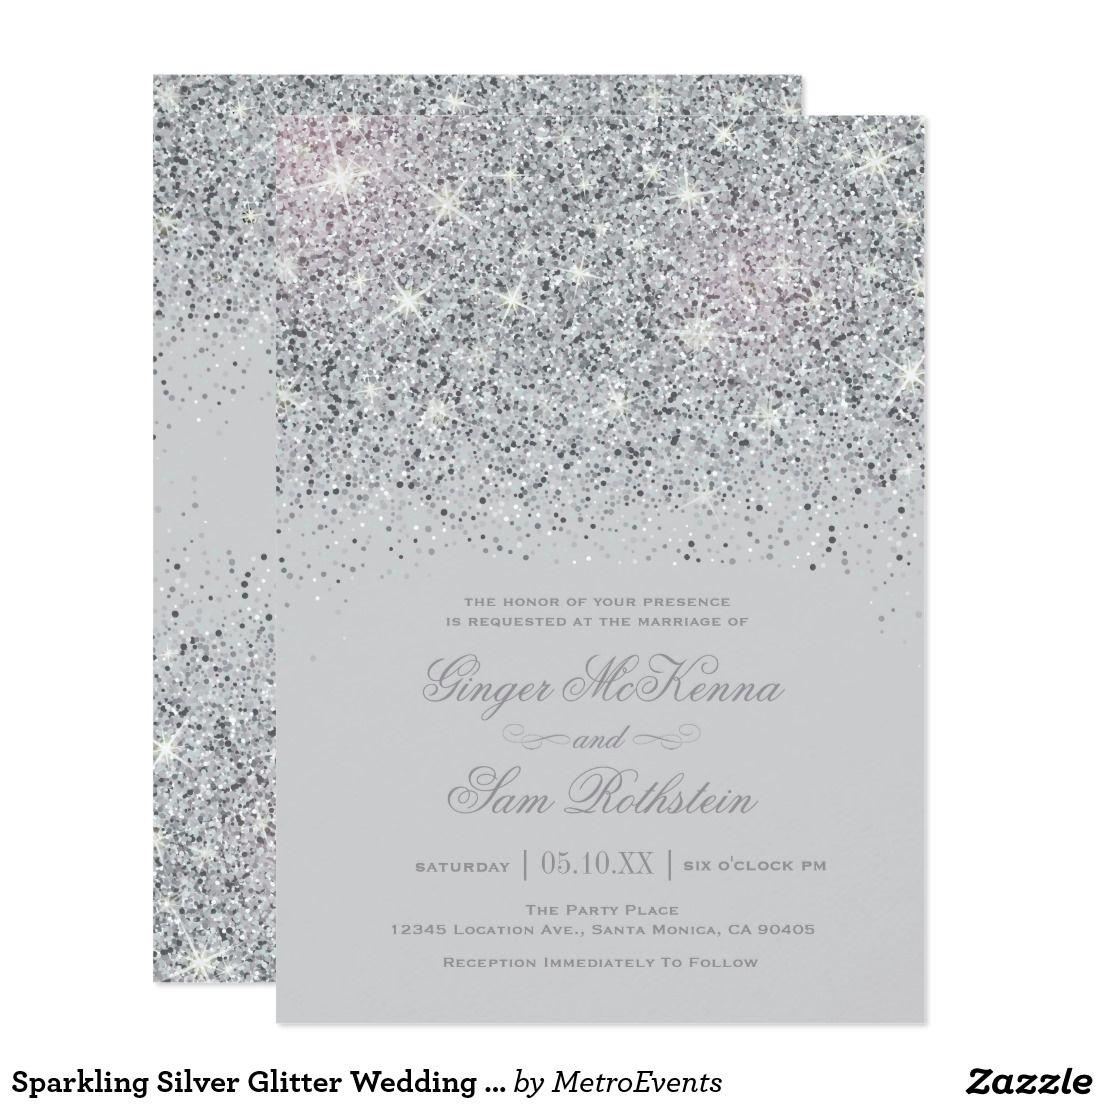 Sparkling Silver Glitter Wedding Invitations Zazzle Com Silver Wedding Invitations Silver Glitter Wedding Invitations Silver Glitter Wedding